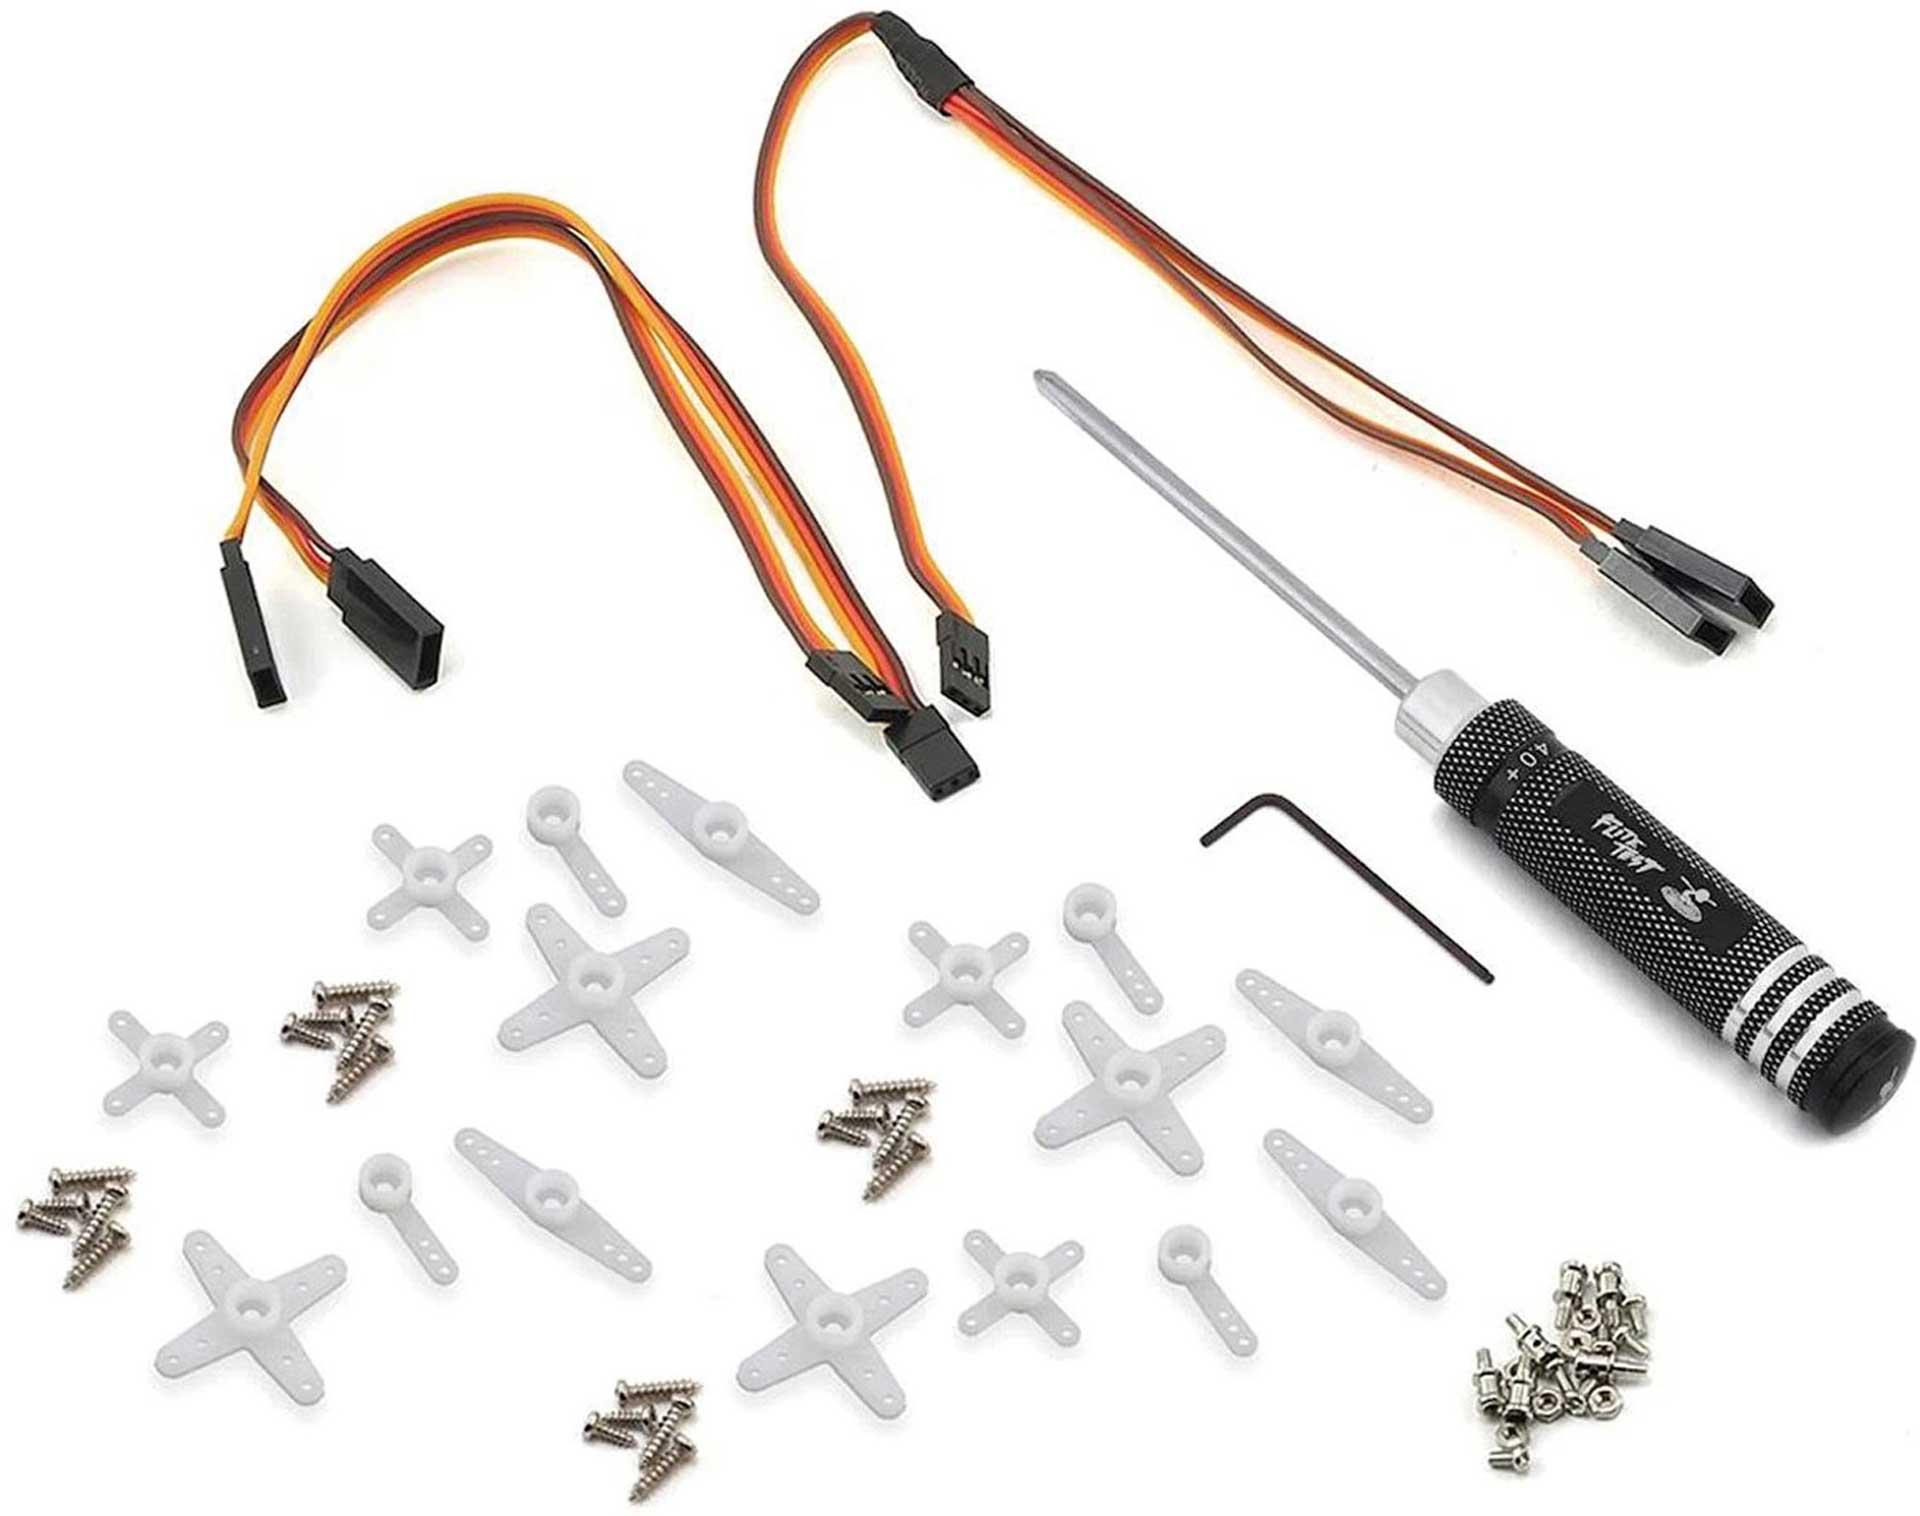 FLITE TEST FT Power Pack A - Radials